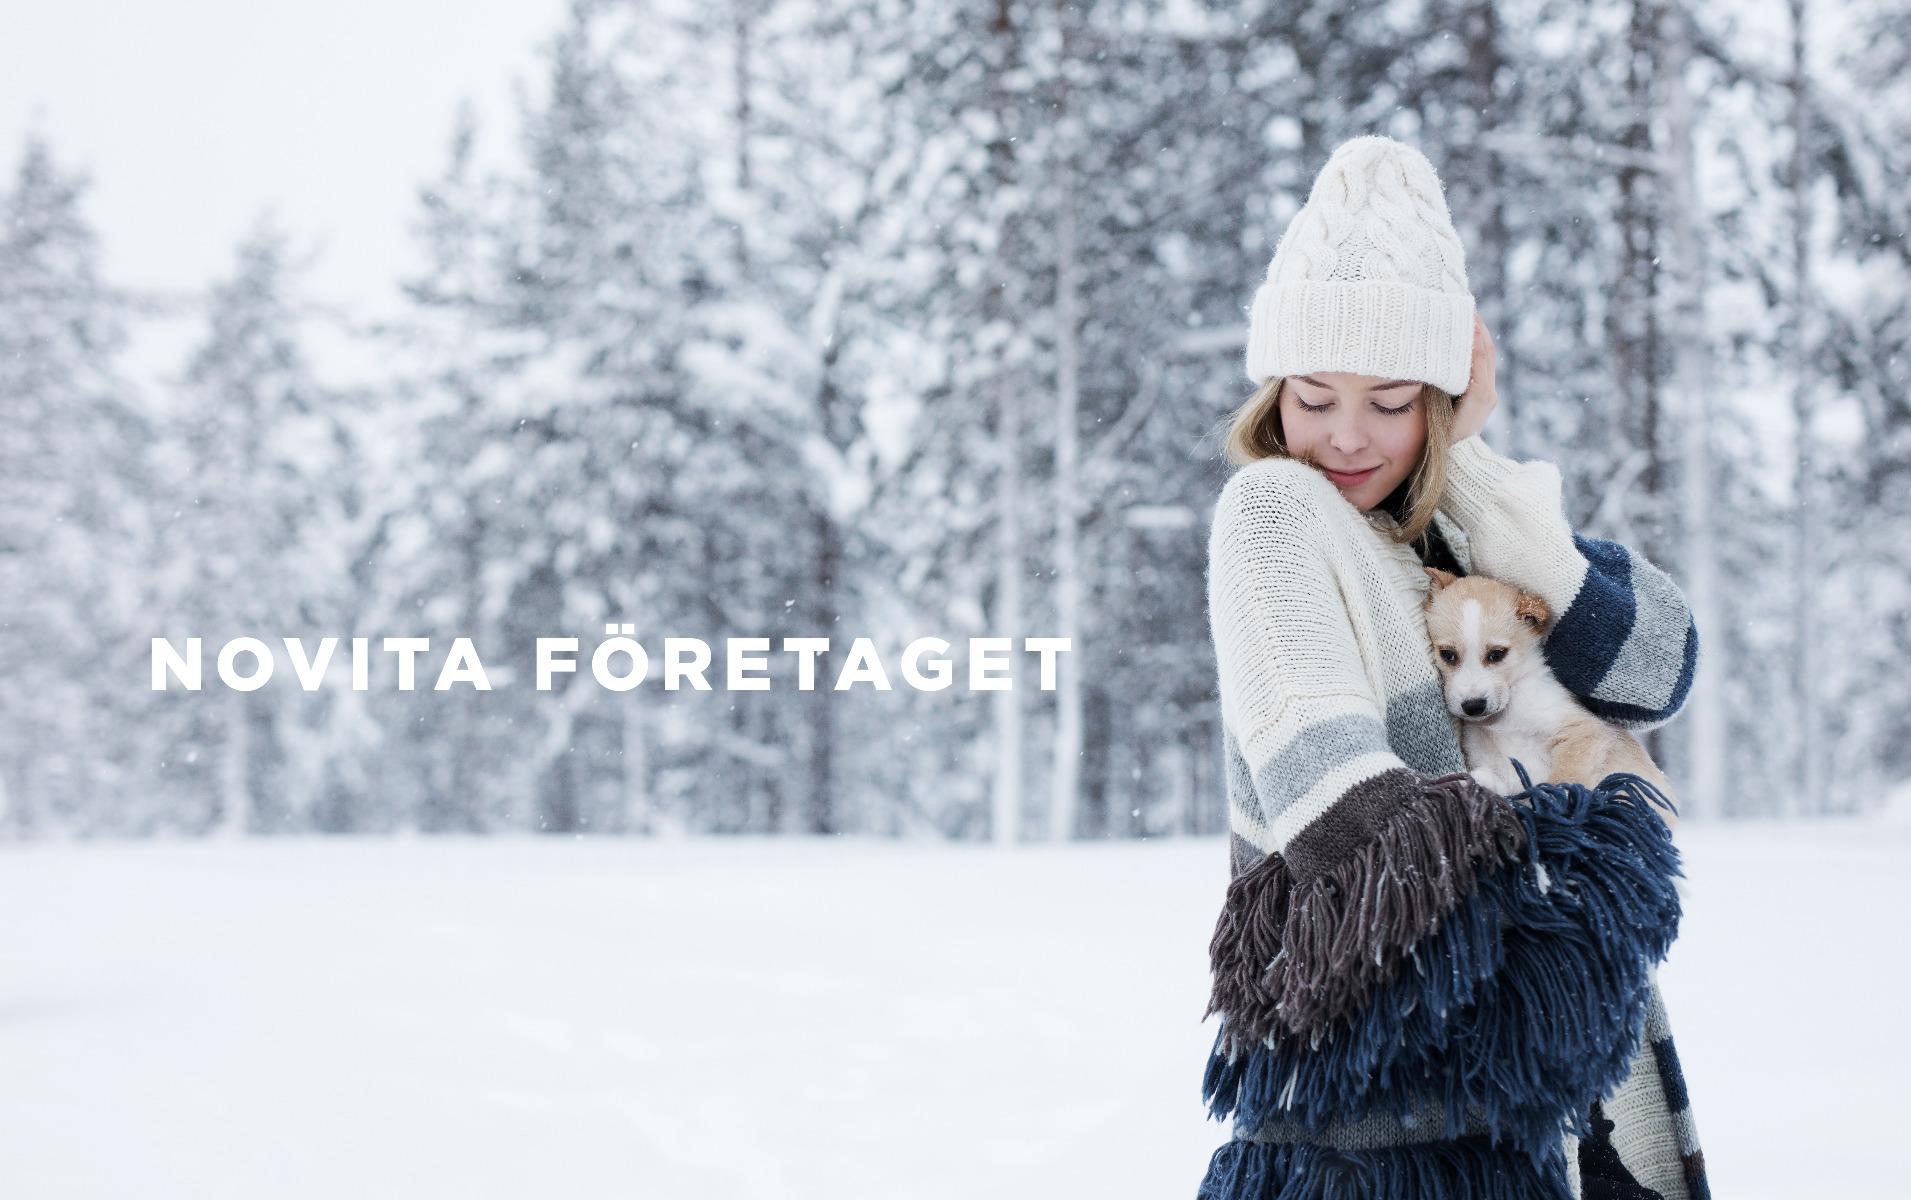 Novita_f_retaget